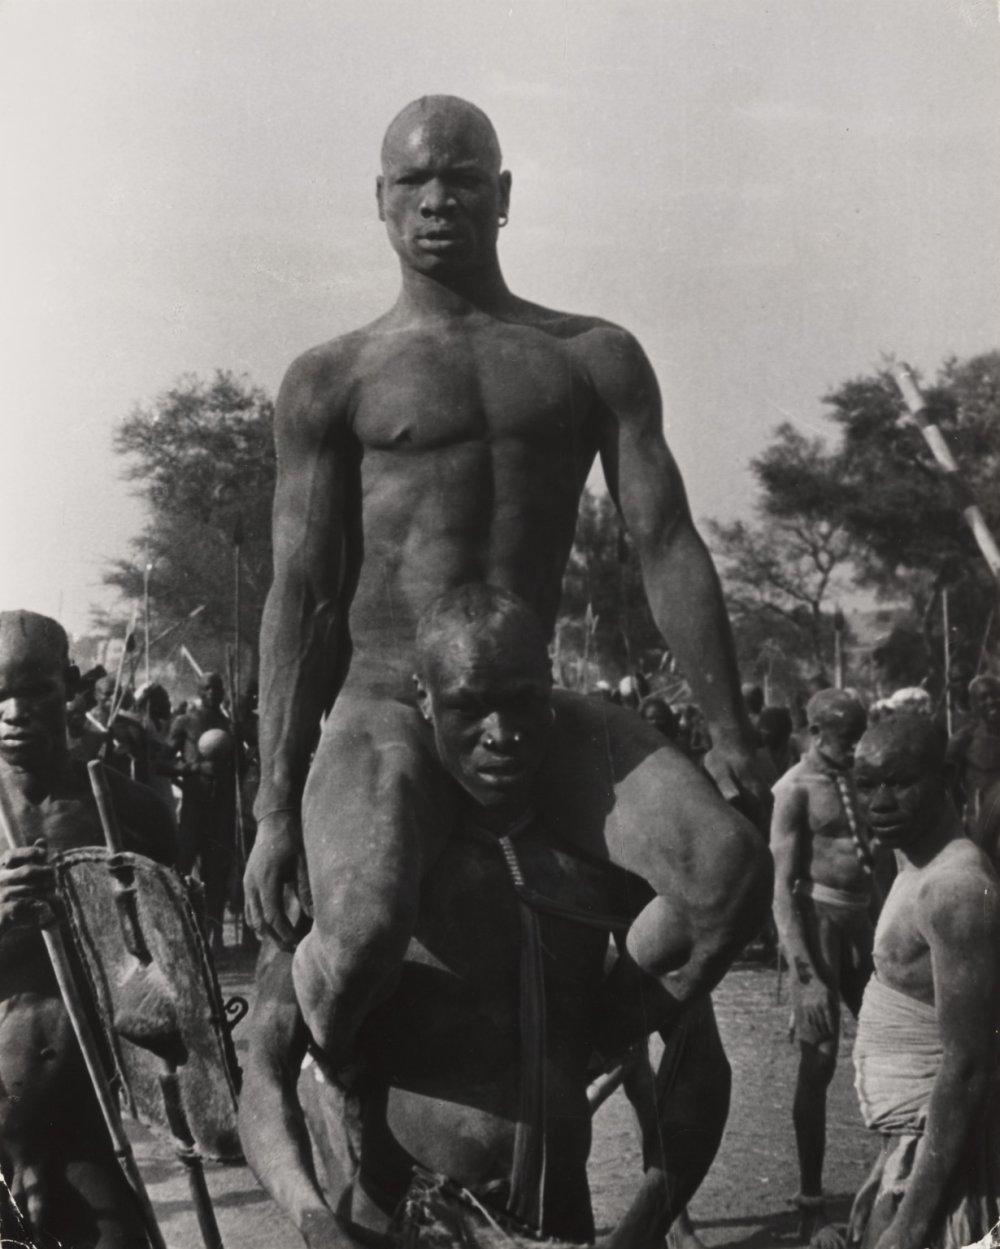 The african women nude wrestlers